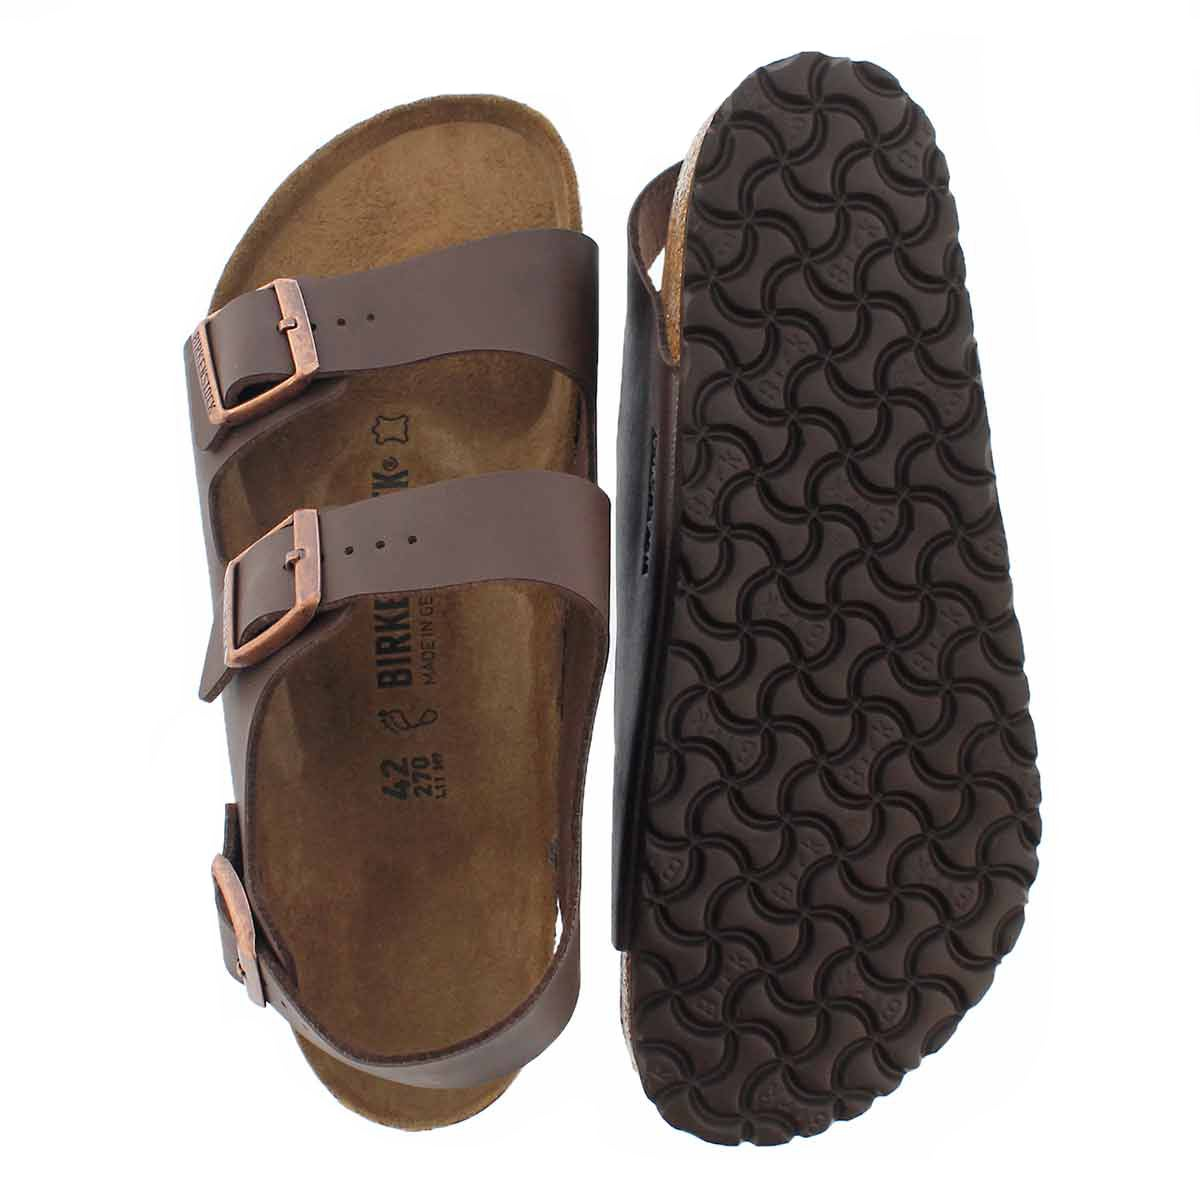 Lds Milano BF brown 3 strap sandal